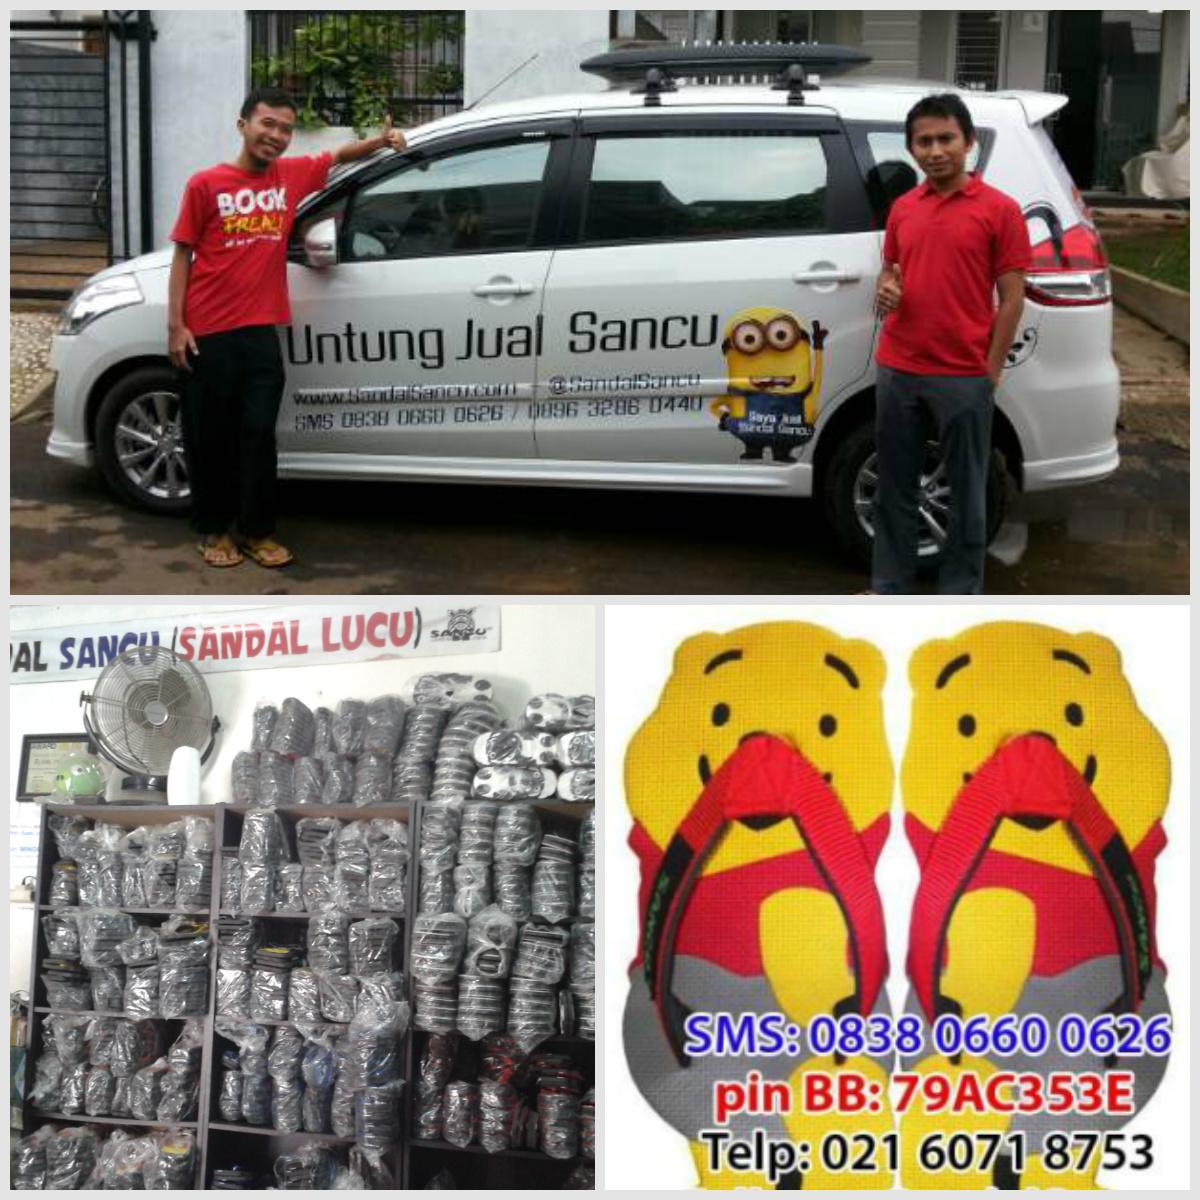 Sancu Jual Sandal SANCU Murah WA 0812 9499 1685